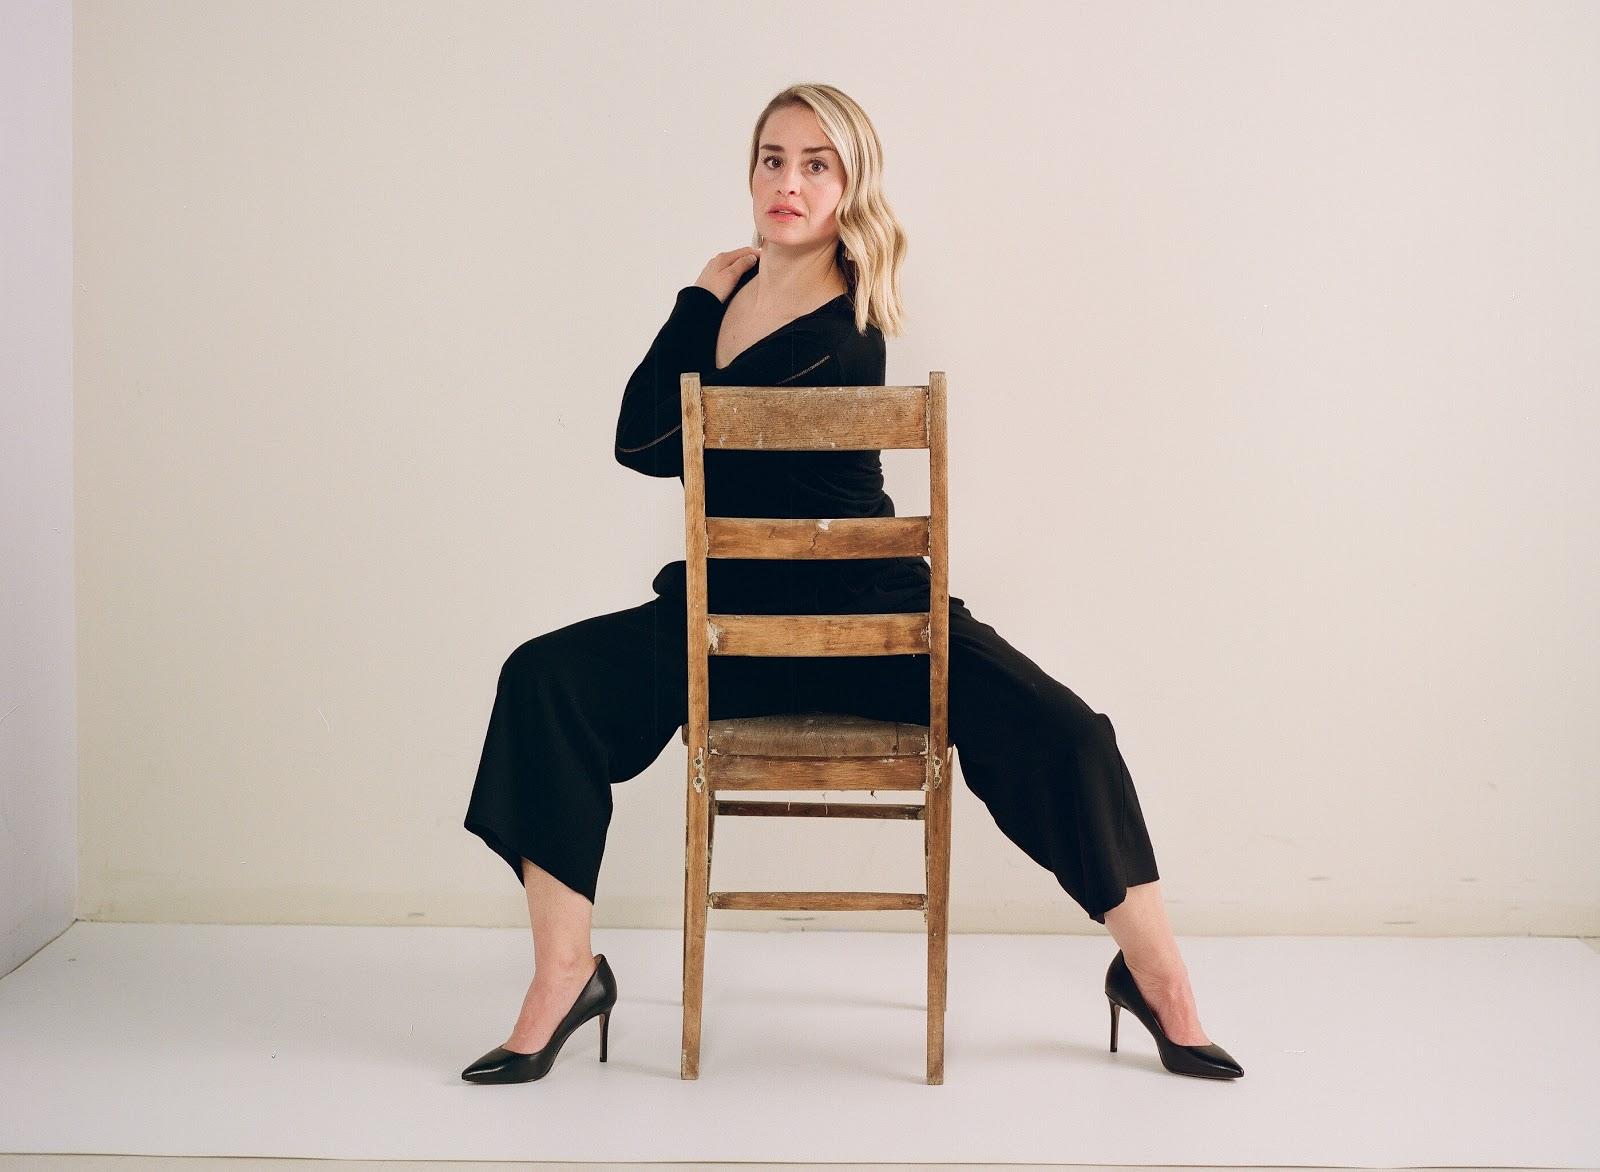 Winter Studio Shoot with Jessica Sansone - Part 2